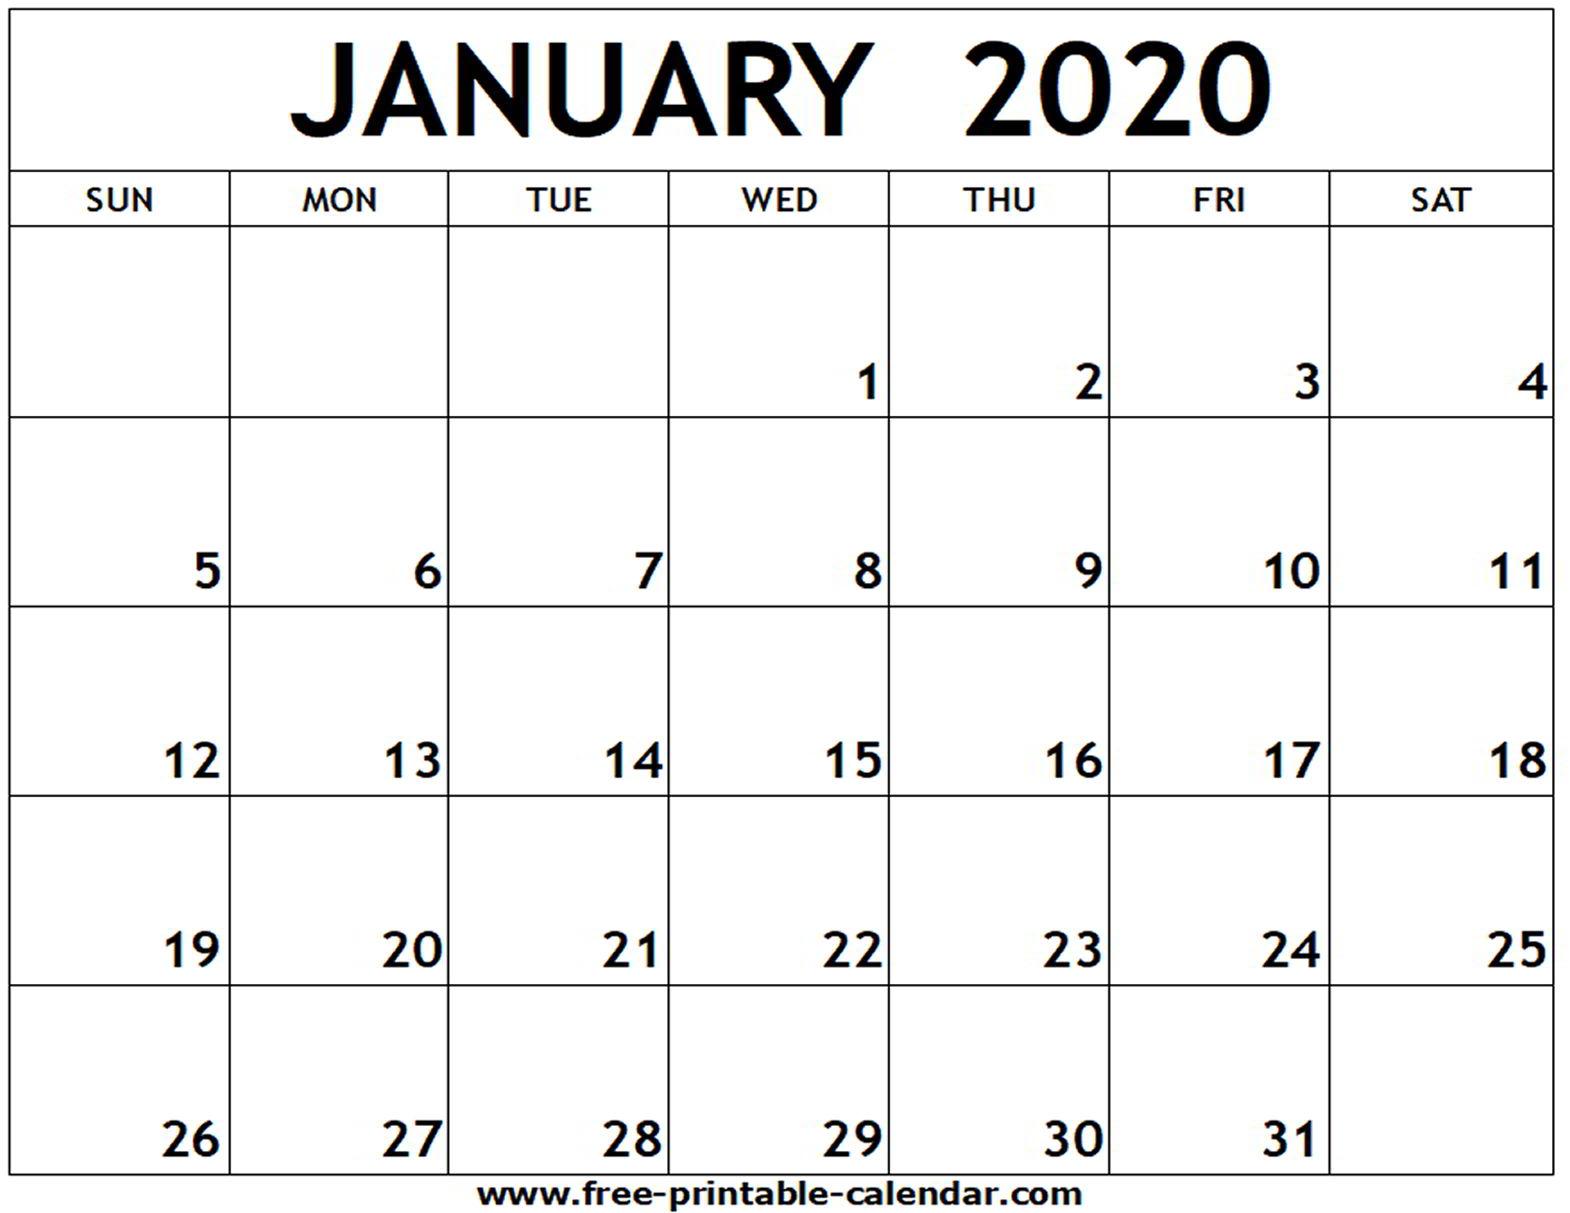 Blank Calendar For 2020 - Tunu.redmini.co